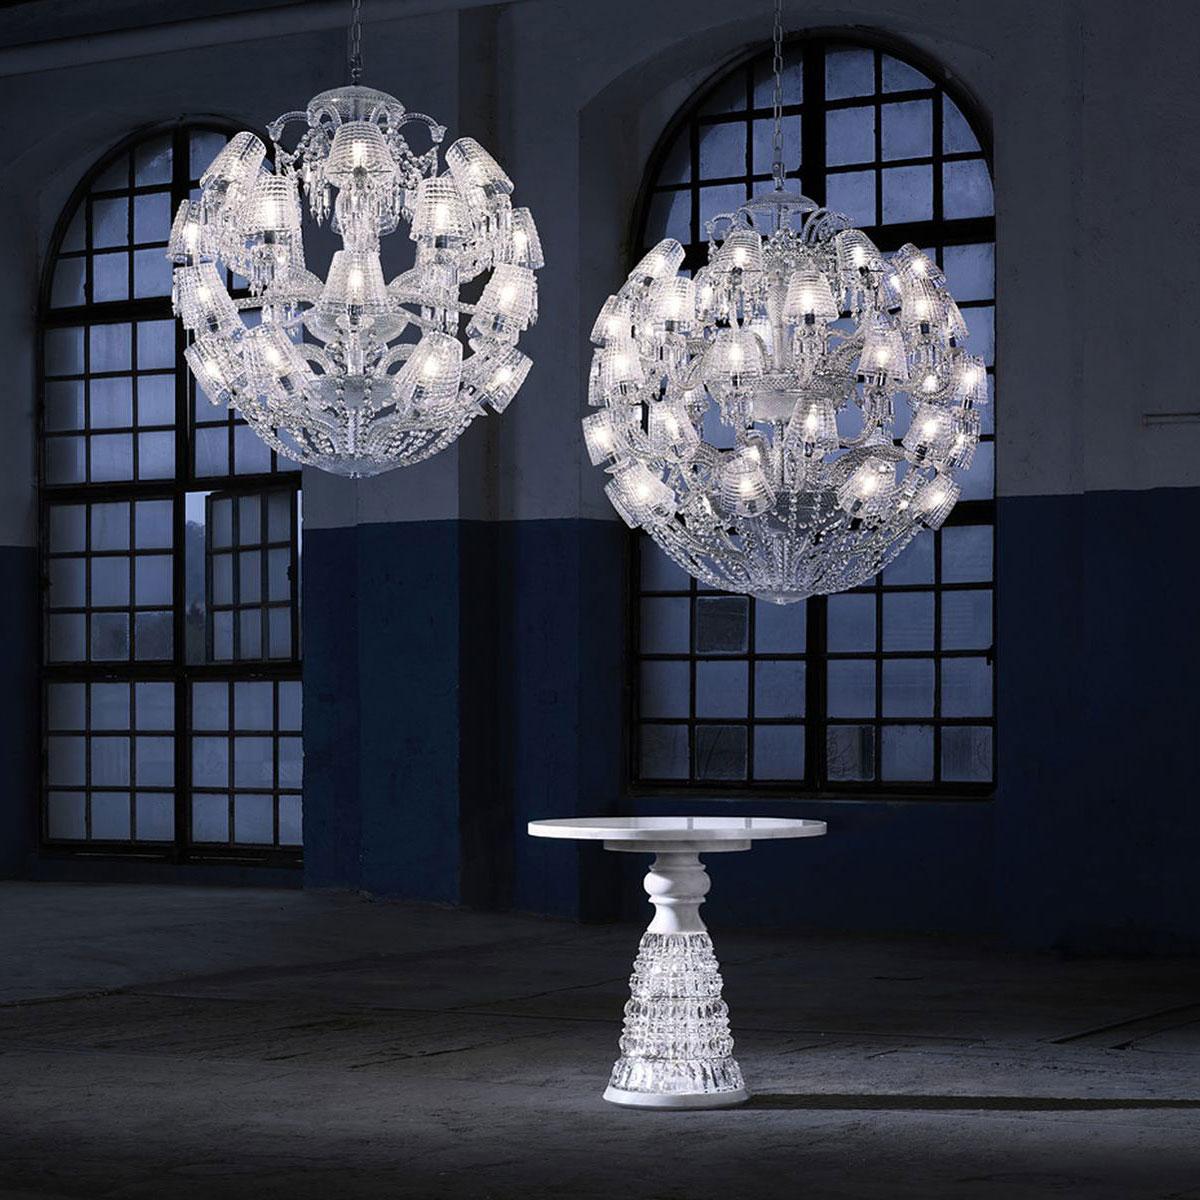 Baccarat Crystal, Le Roi Soleil 24 Light Chandelier